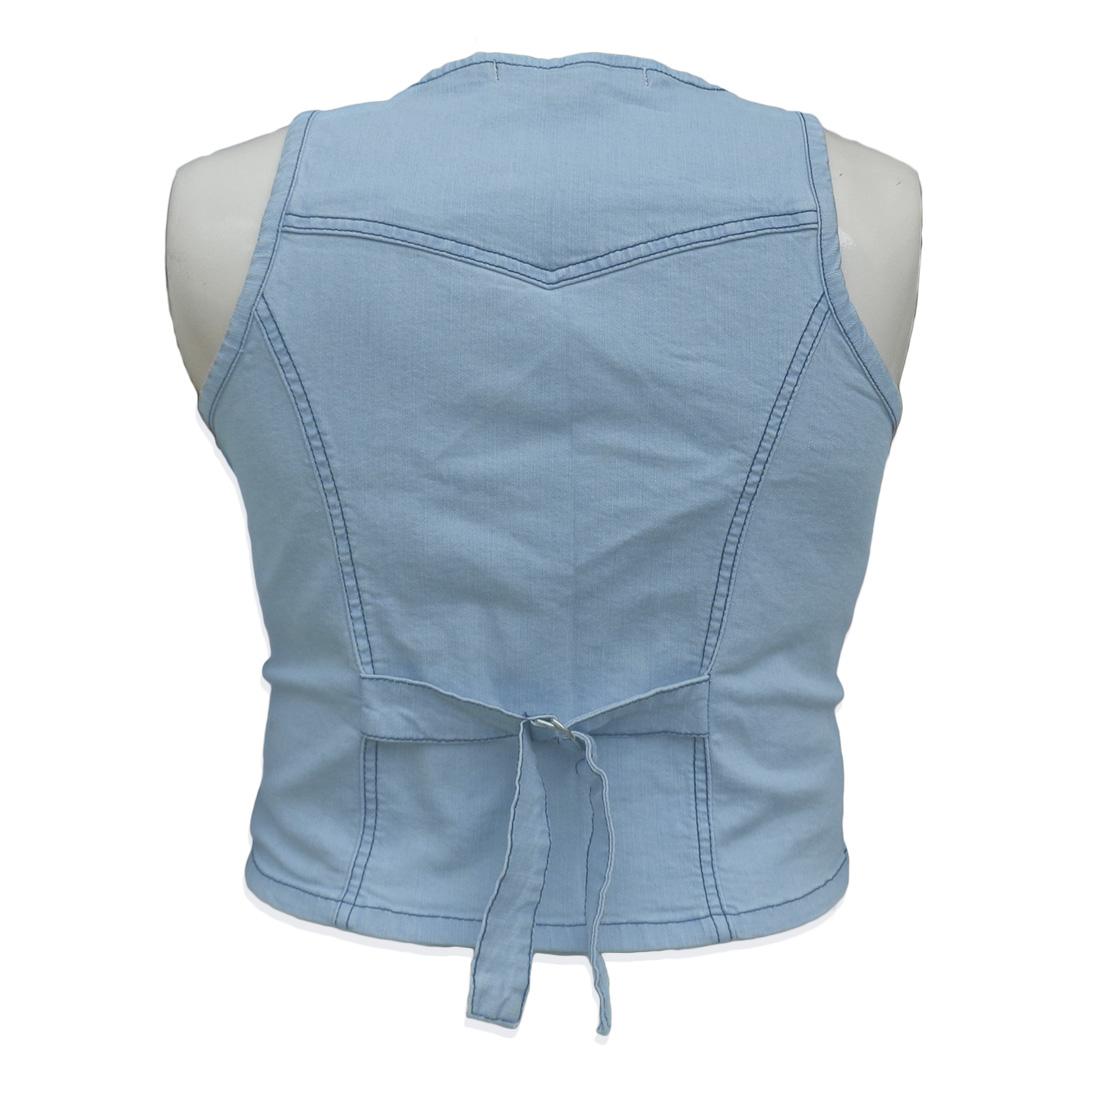 Colete Jeans Feminino Cropped Plus Size